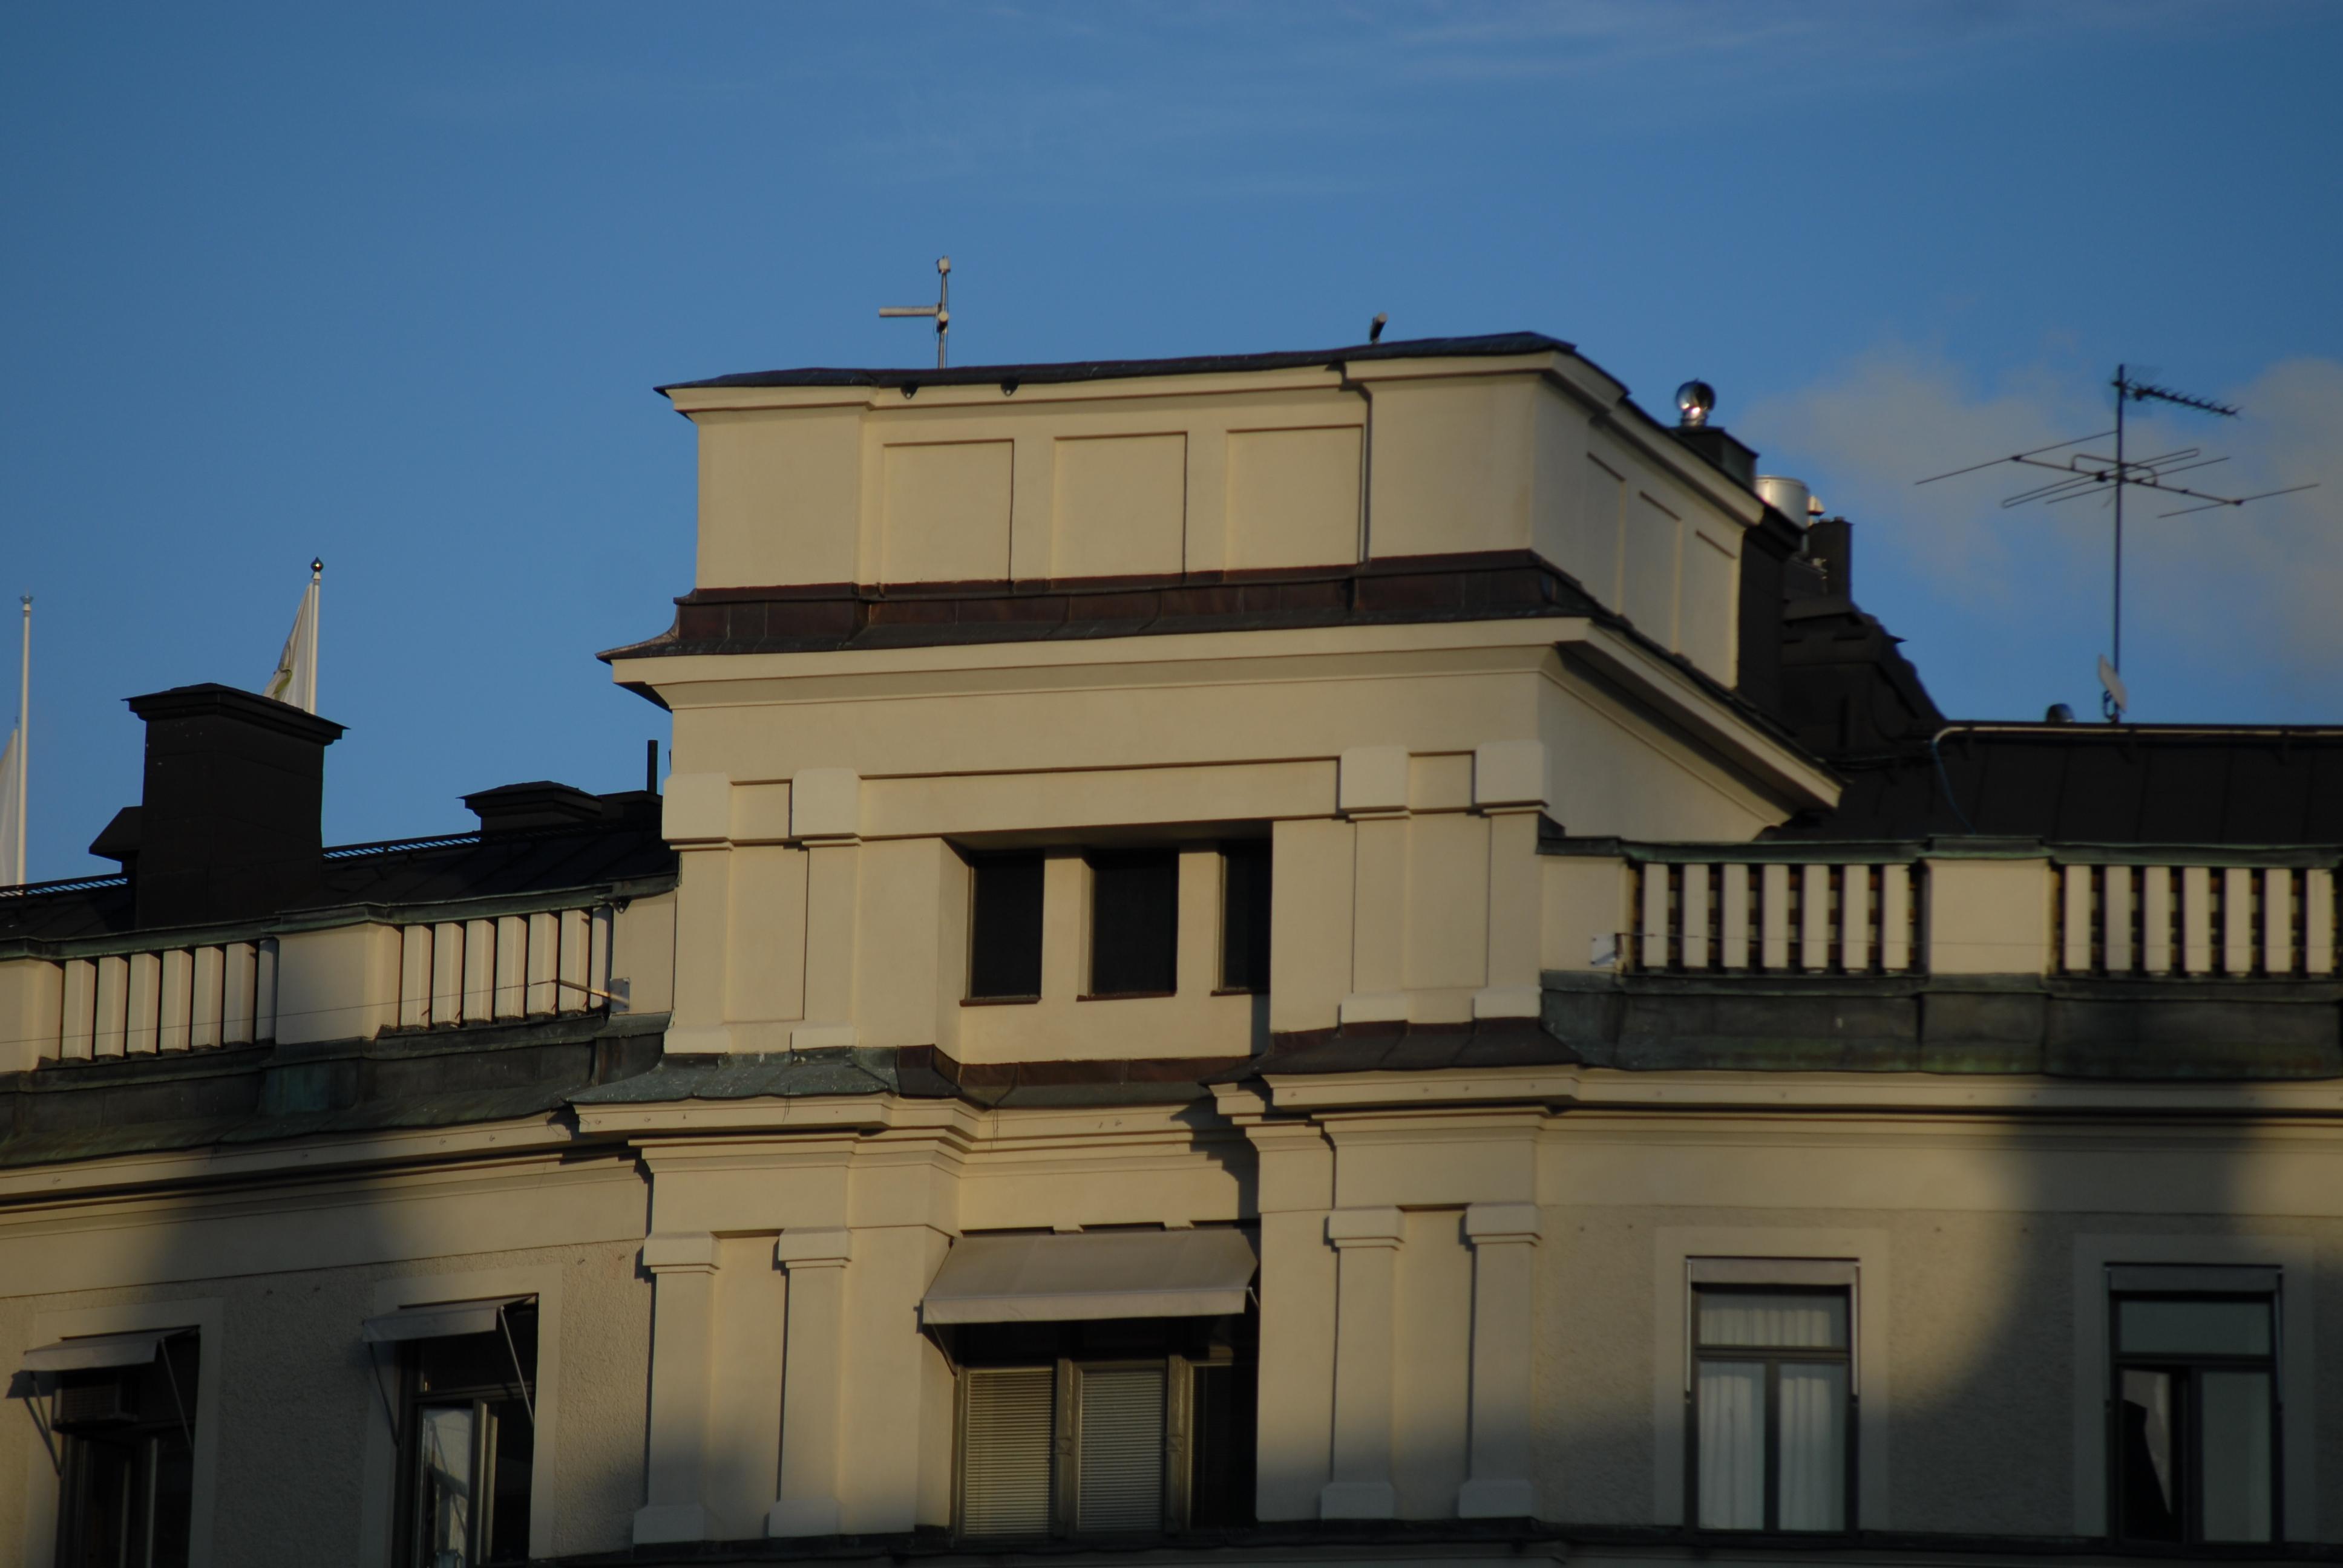 Vit byggnad